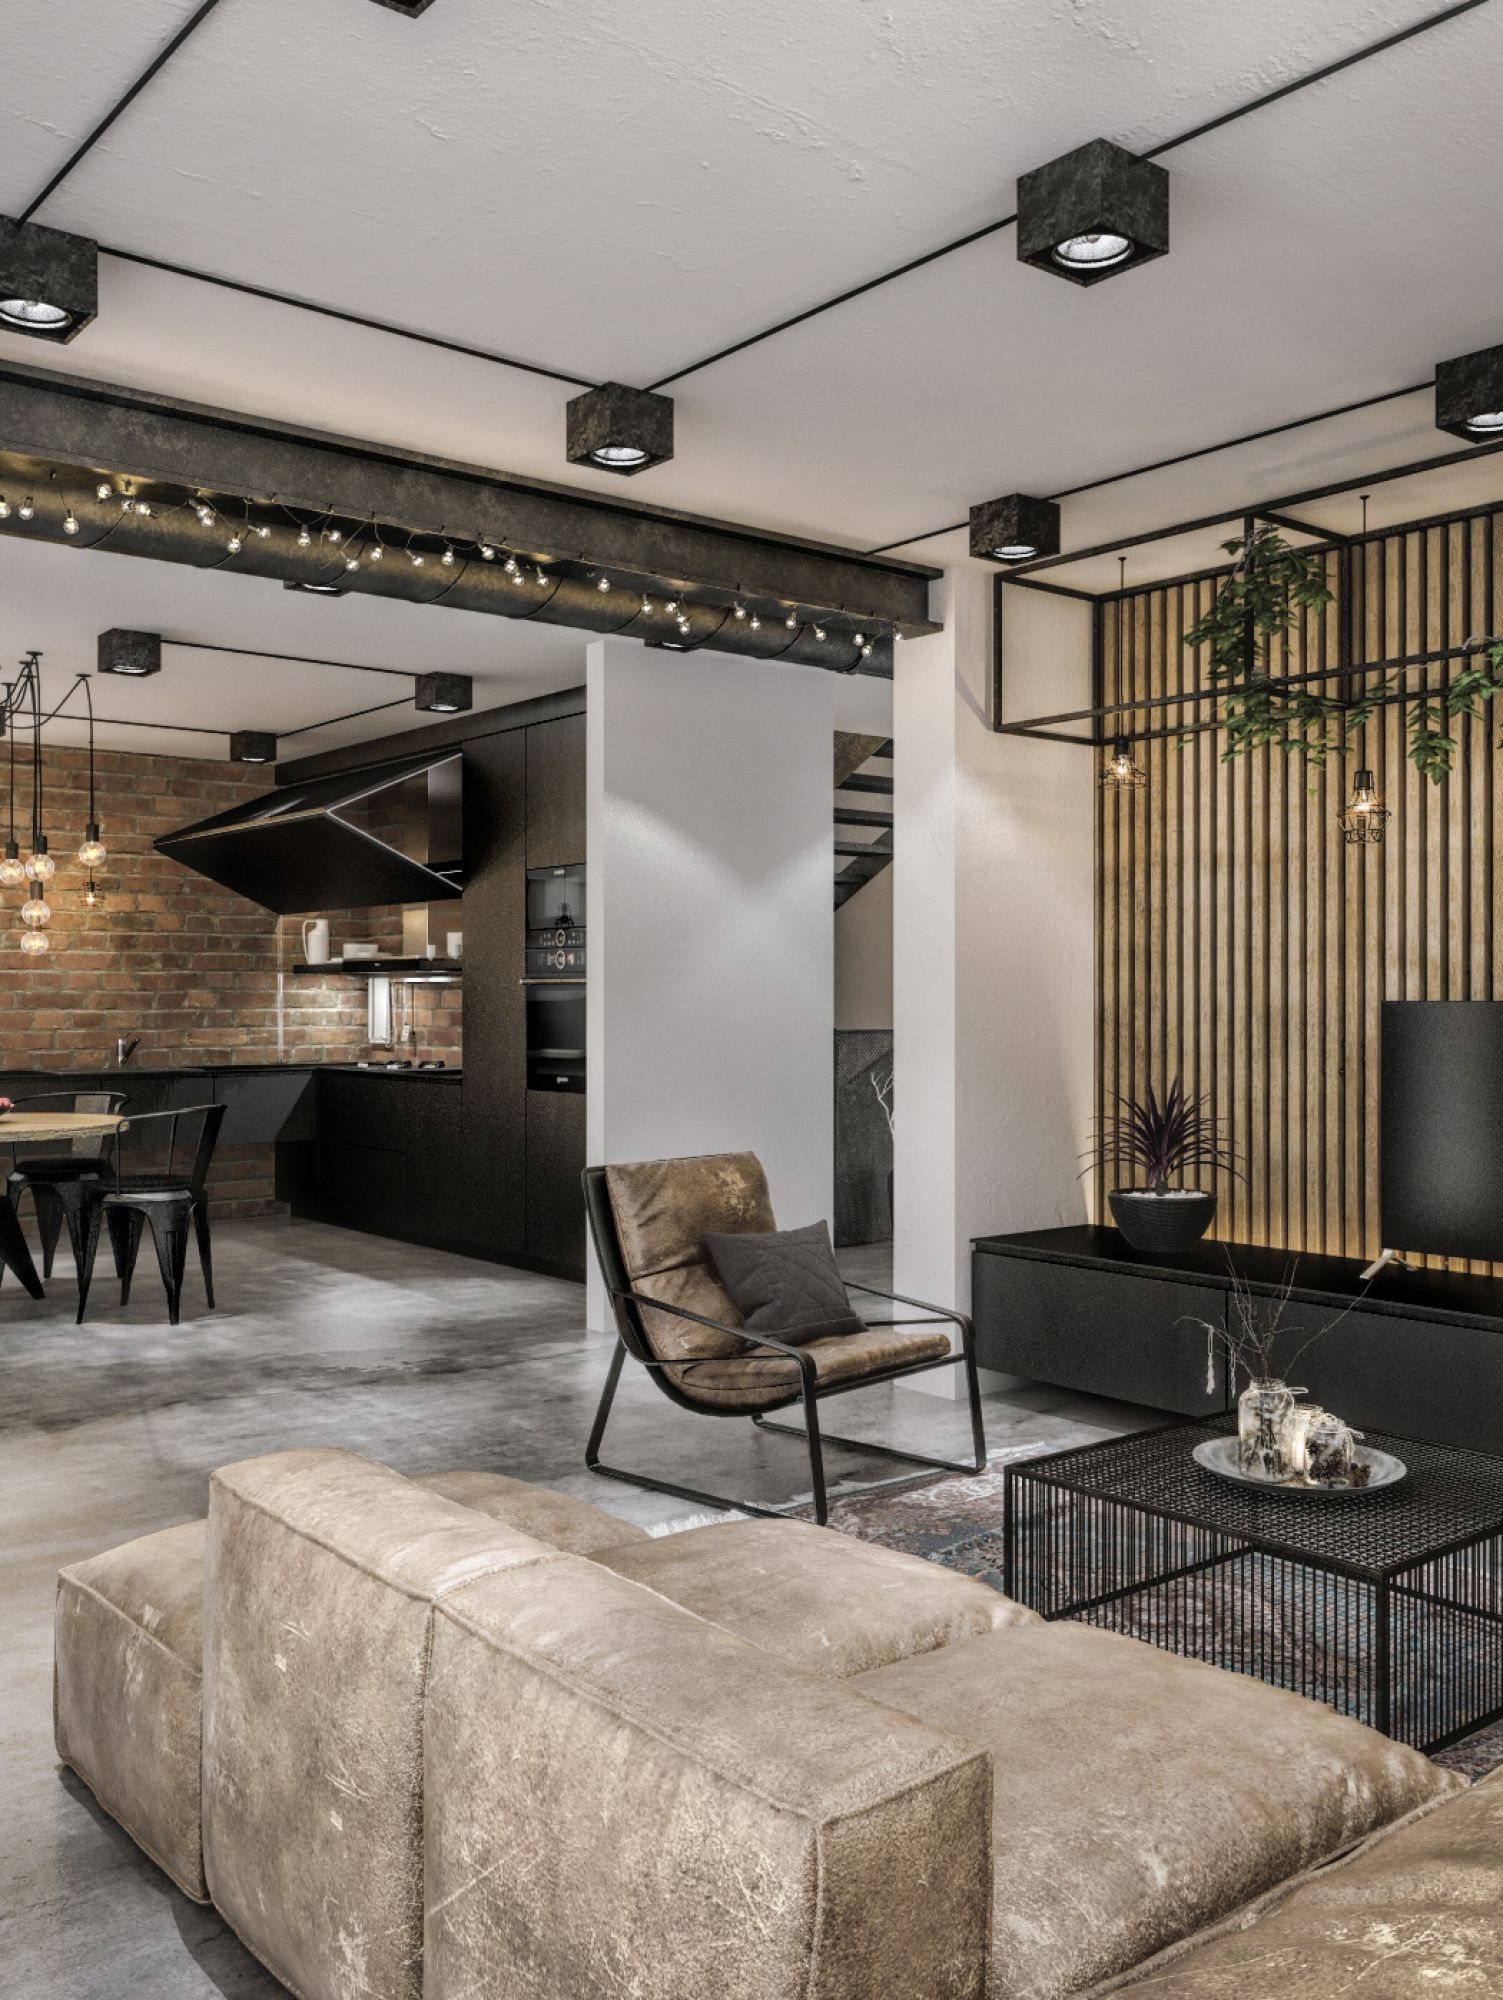 Modern loft interior Architecture A Pinterest Loft interiors